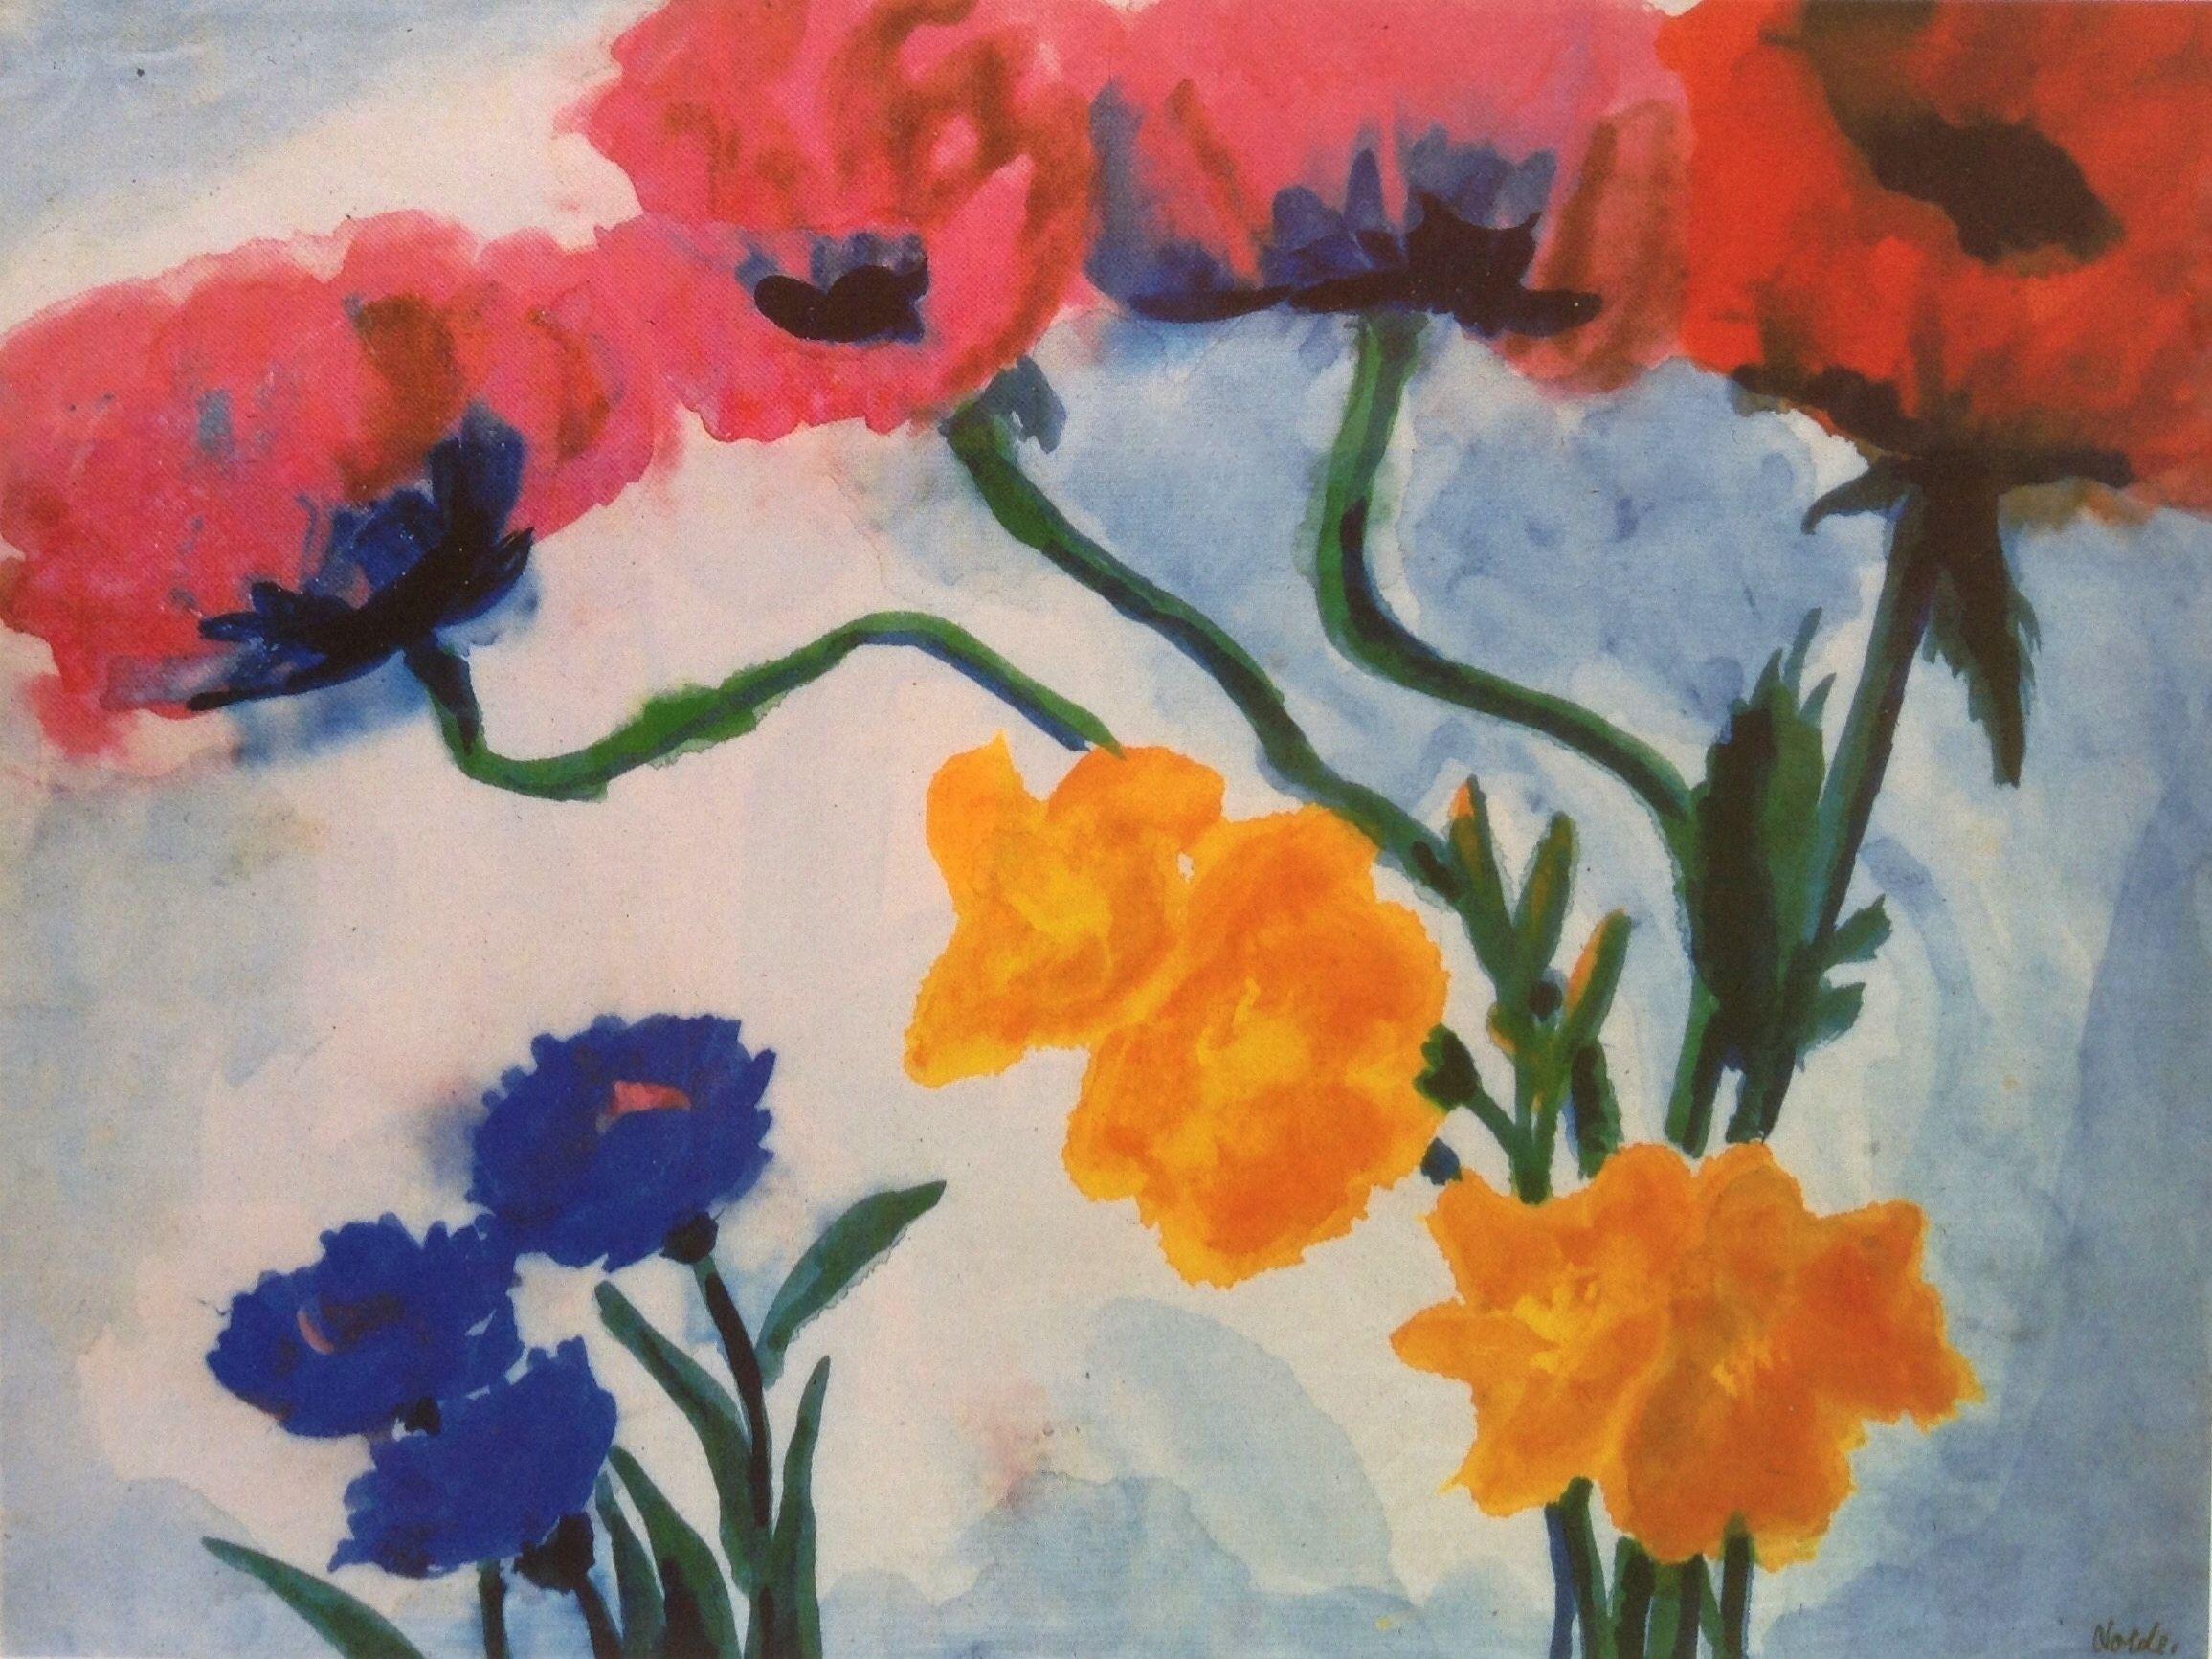 Emil Nolde Mohnblumen Emil Nolde Watercolor Flowers Poppies